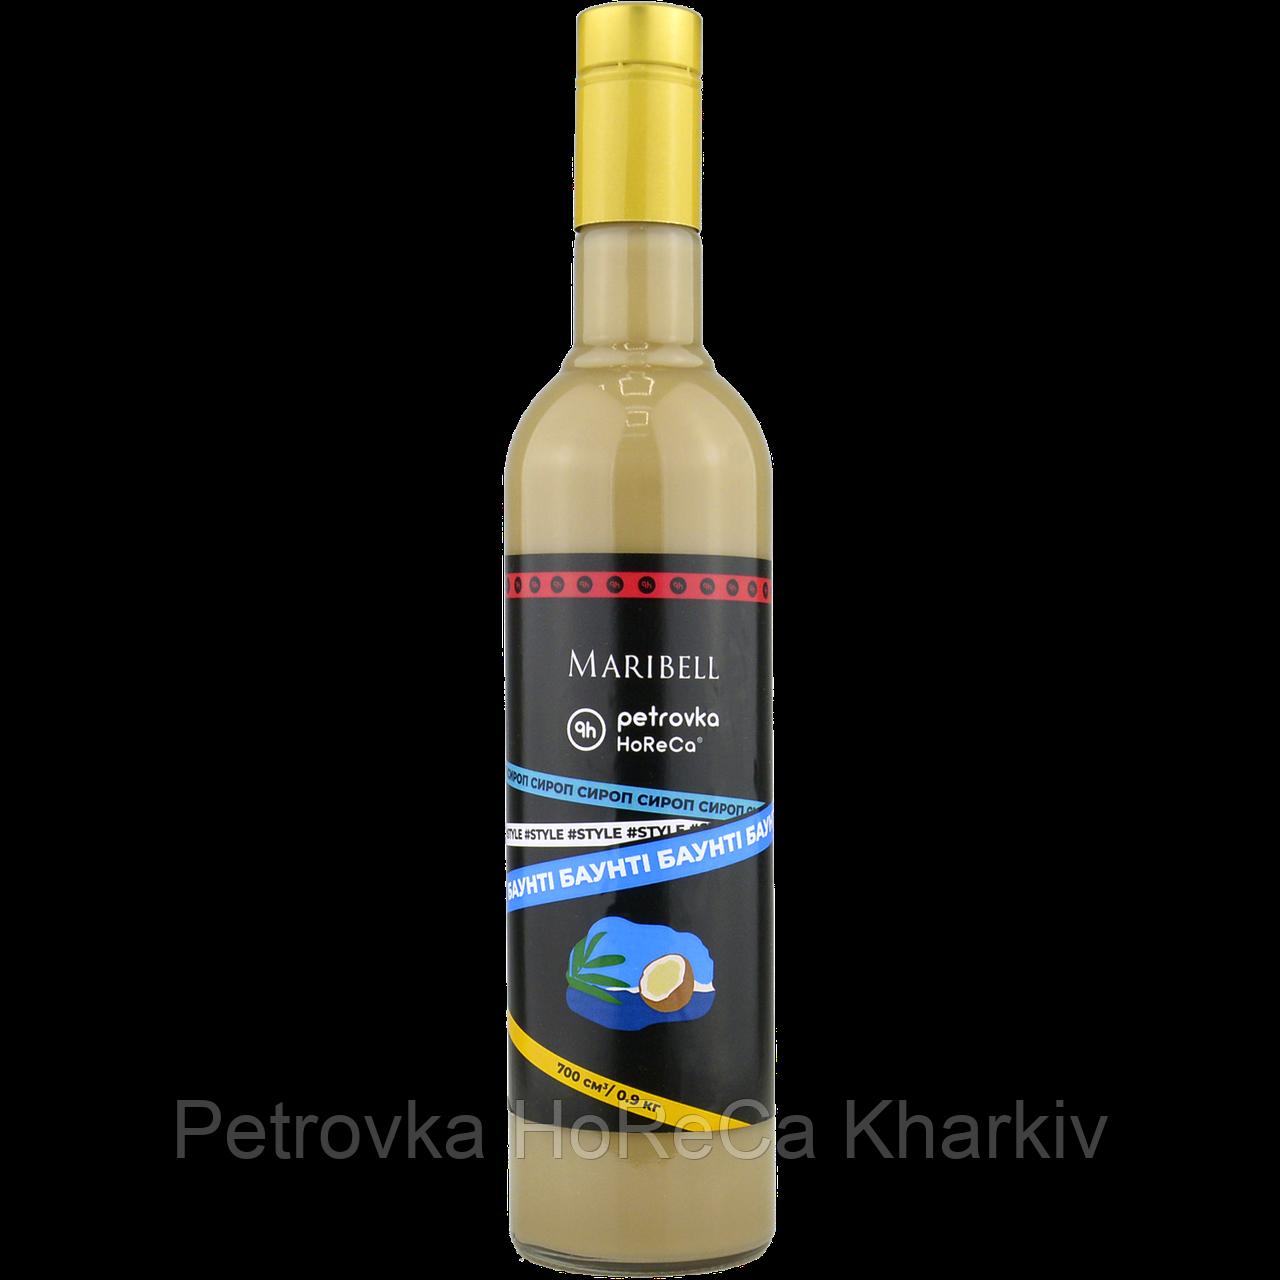 Сироп 'Баунти' для коктейлей Maribell-Petrovka Horeca 700мл